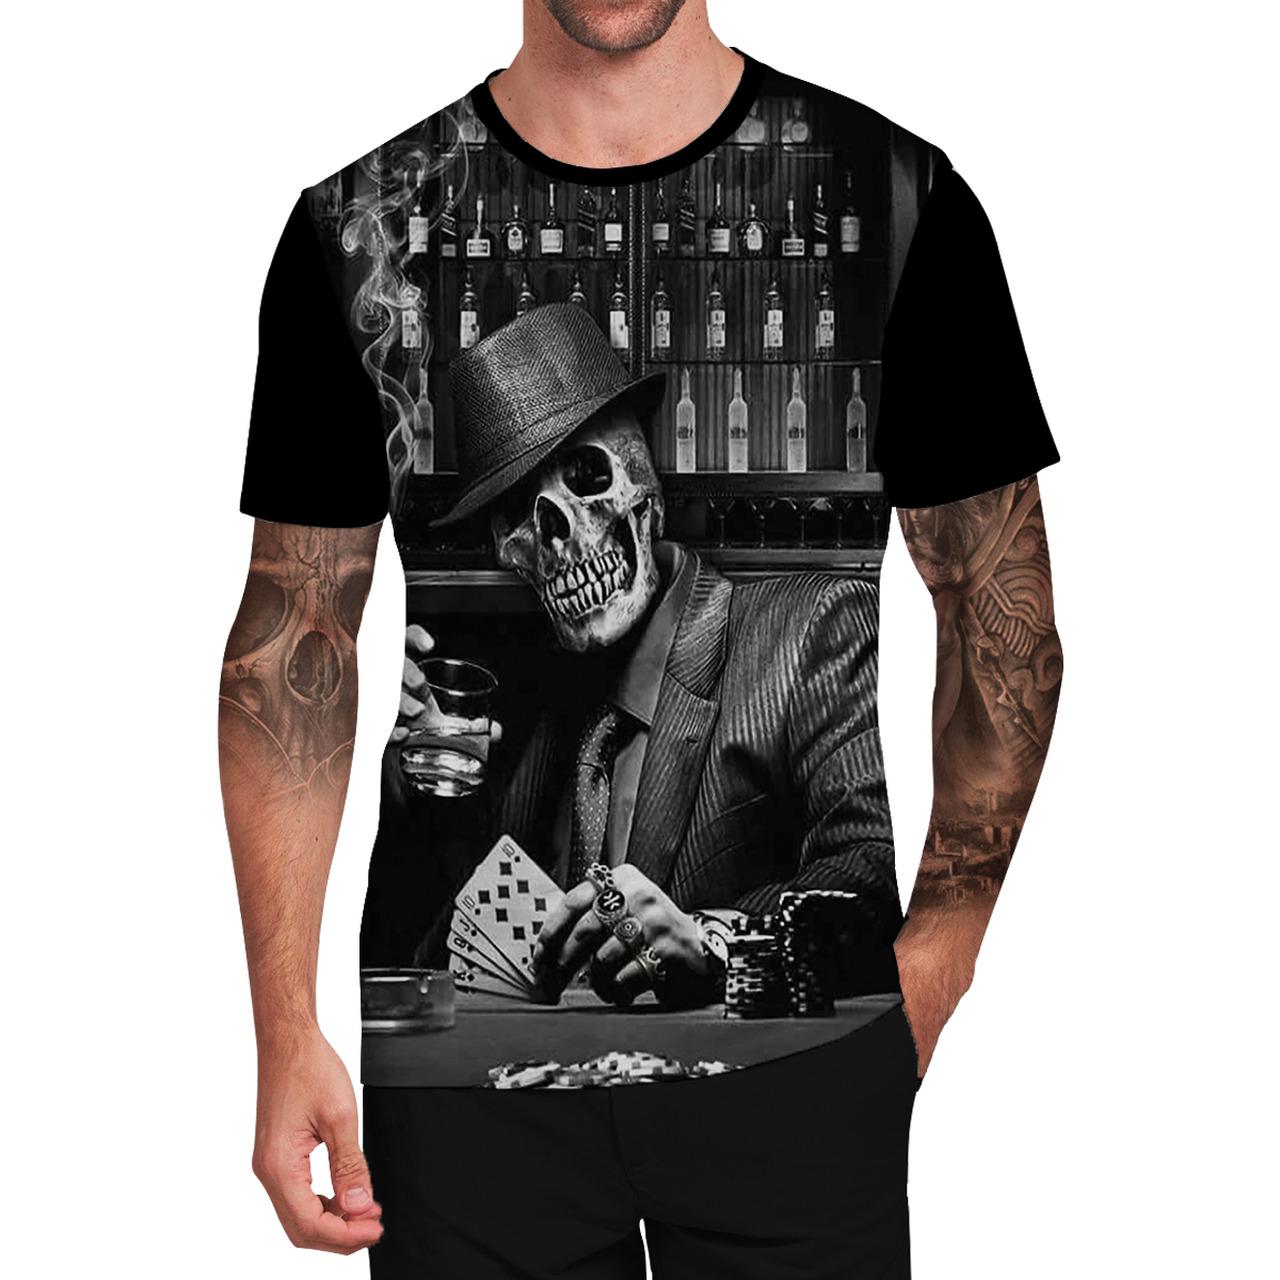 Stompy Camiseta Tattoo Tatuagem Caveira Skull 19